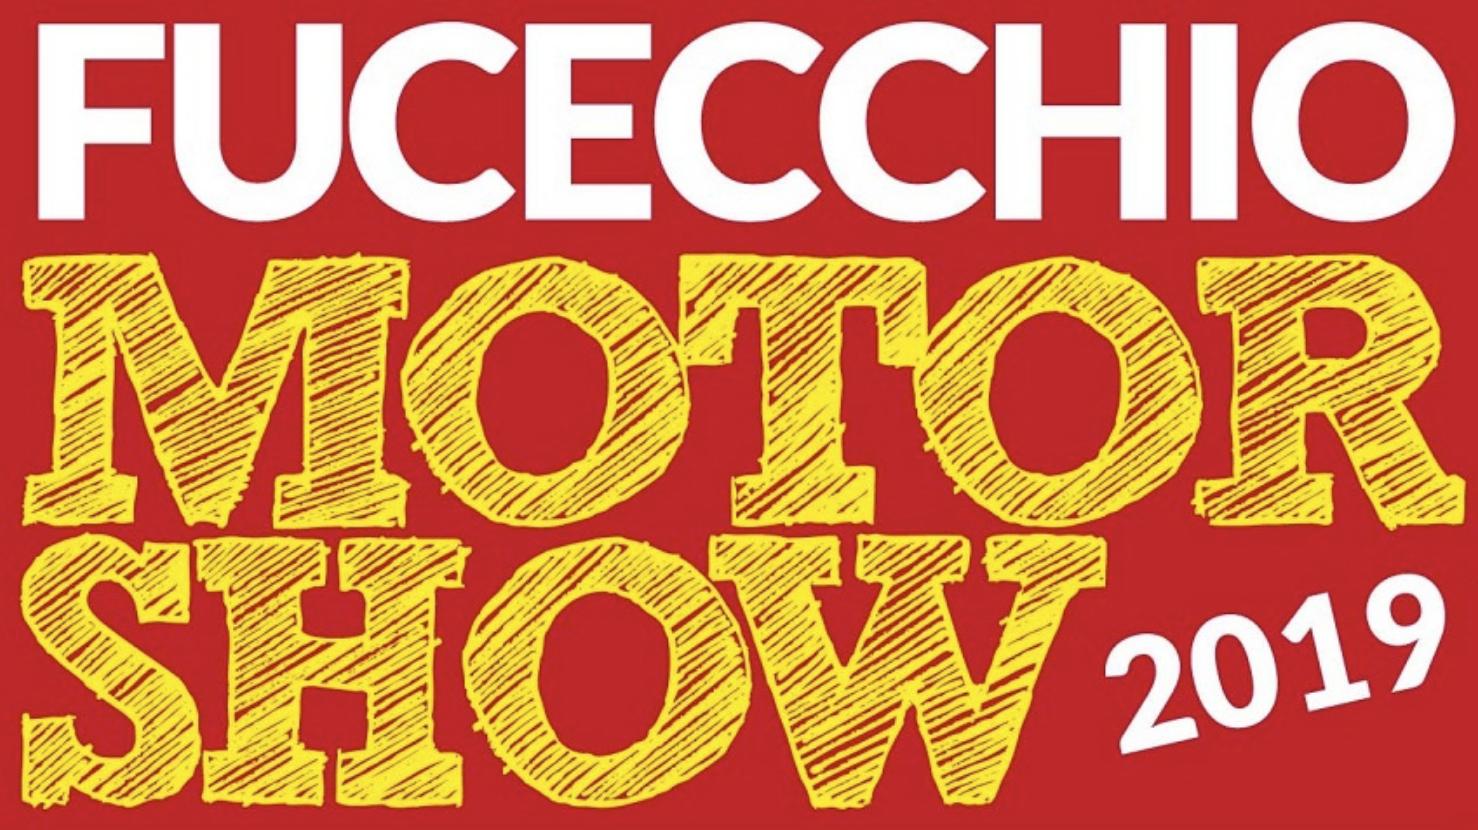 Fucecchio Motor Show 2019